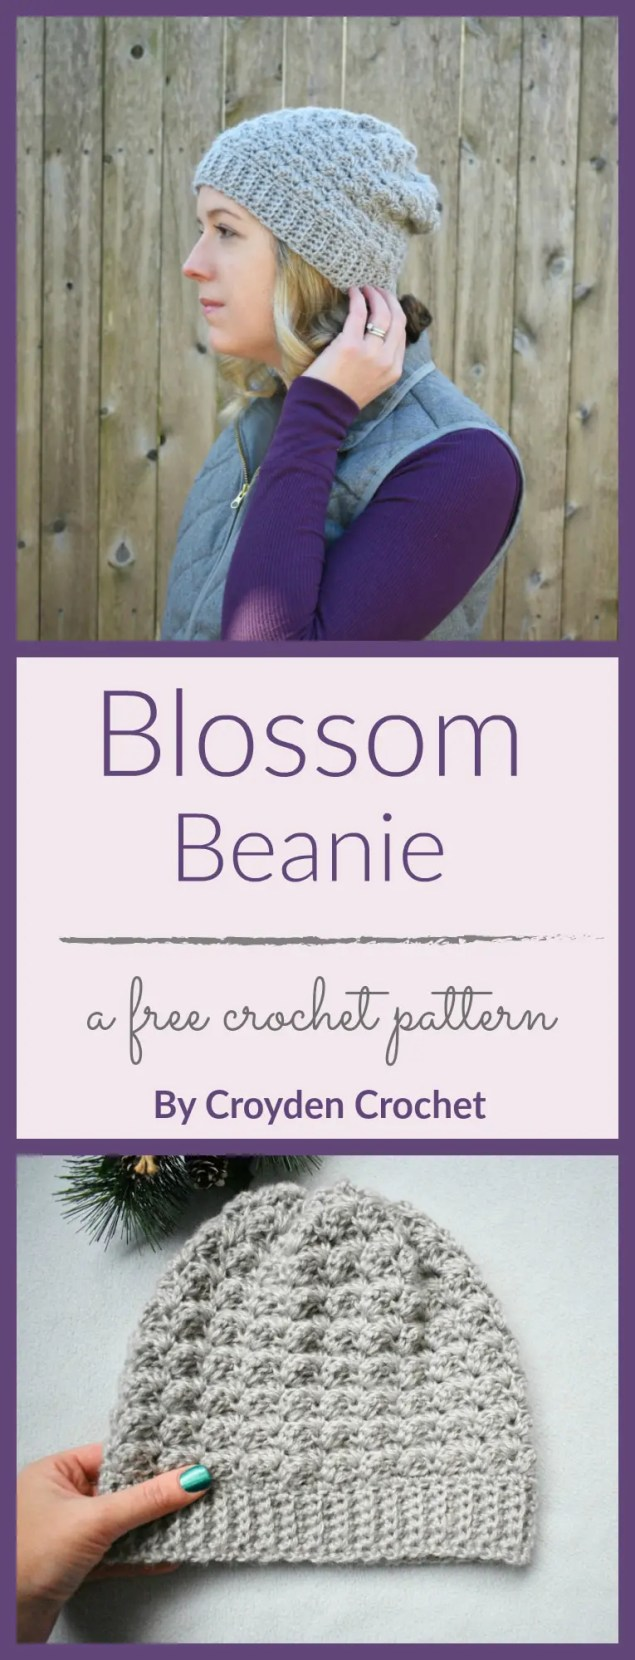 blossom beanie pin image